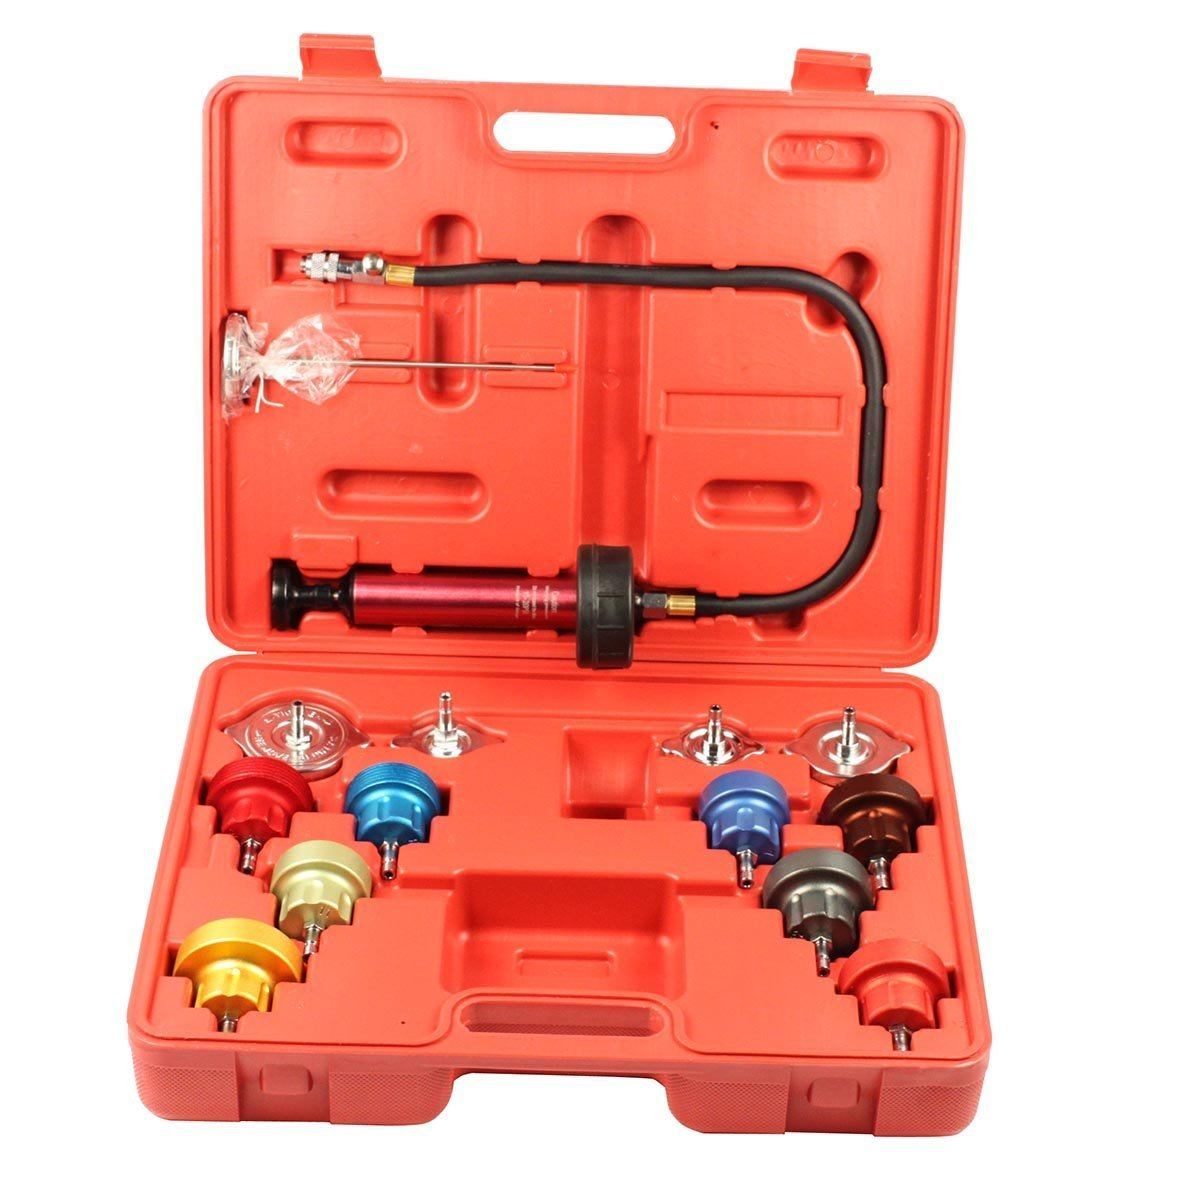 14pc Radiator Pump Pressure Leak Tester Checker Kit Aluminum Adapters w/Case